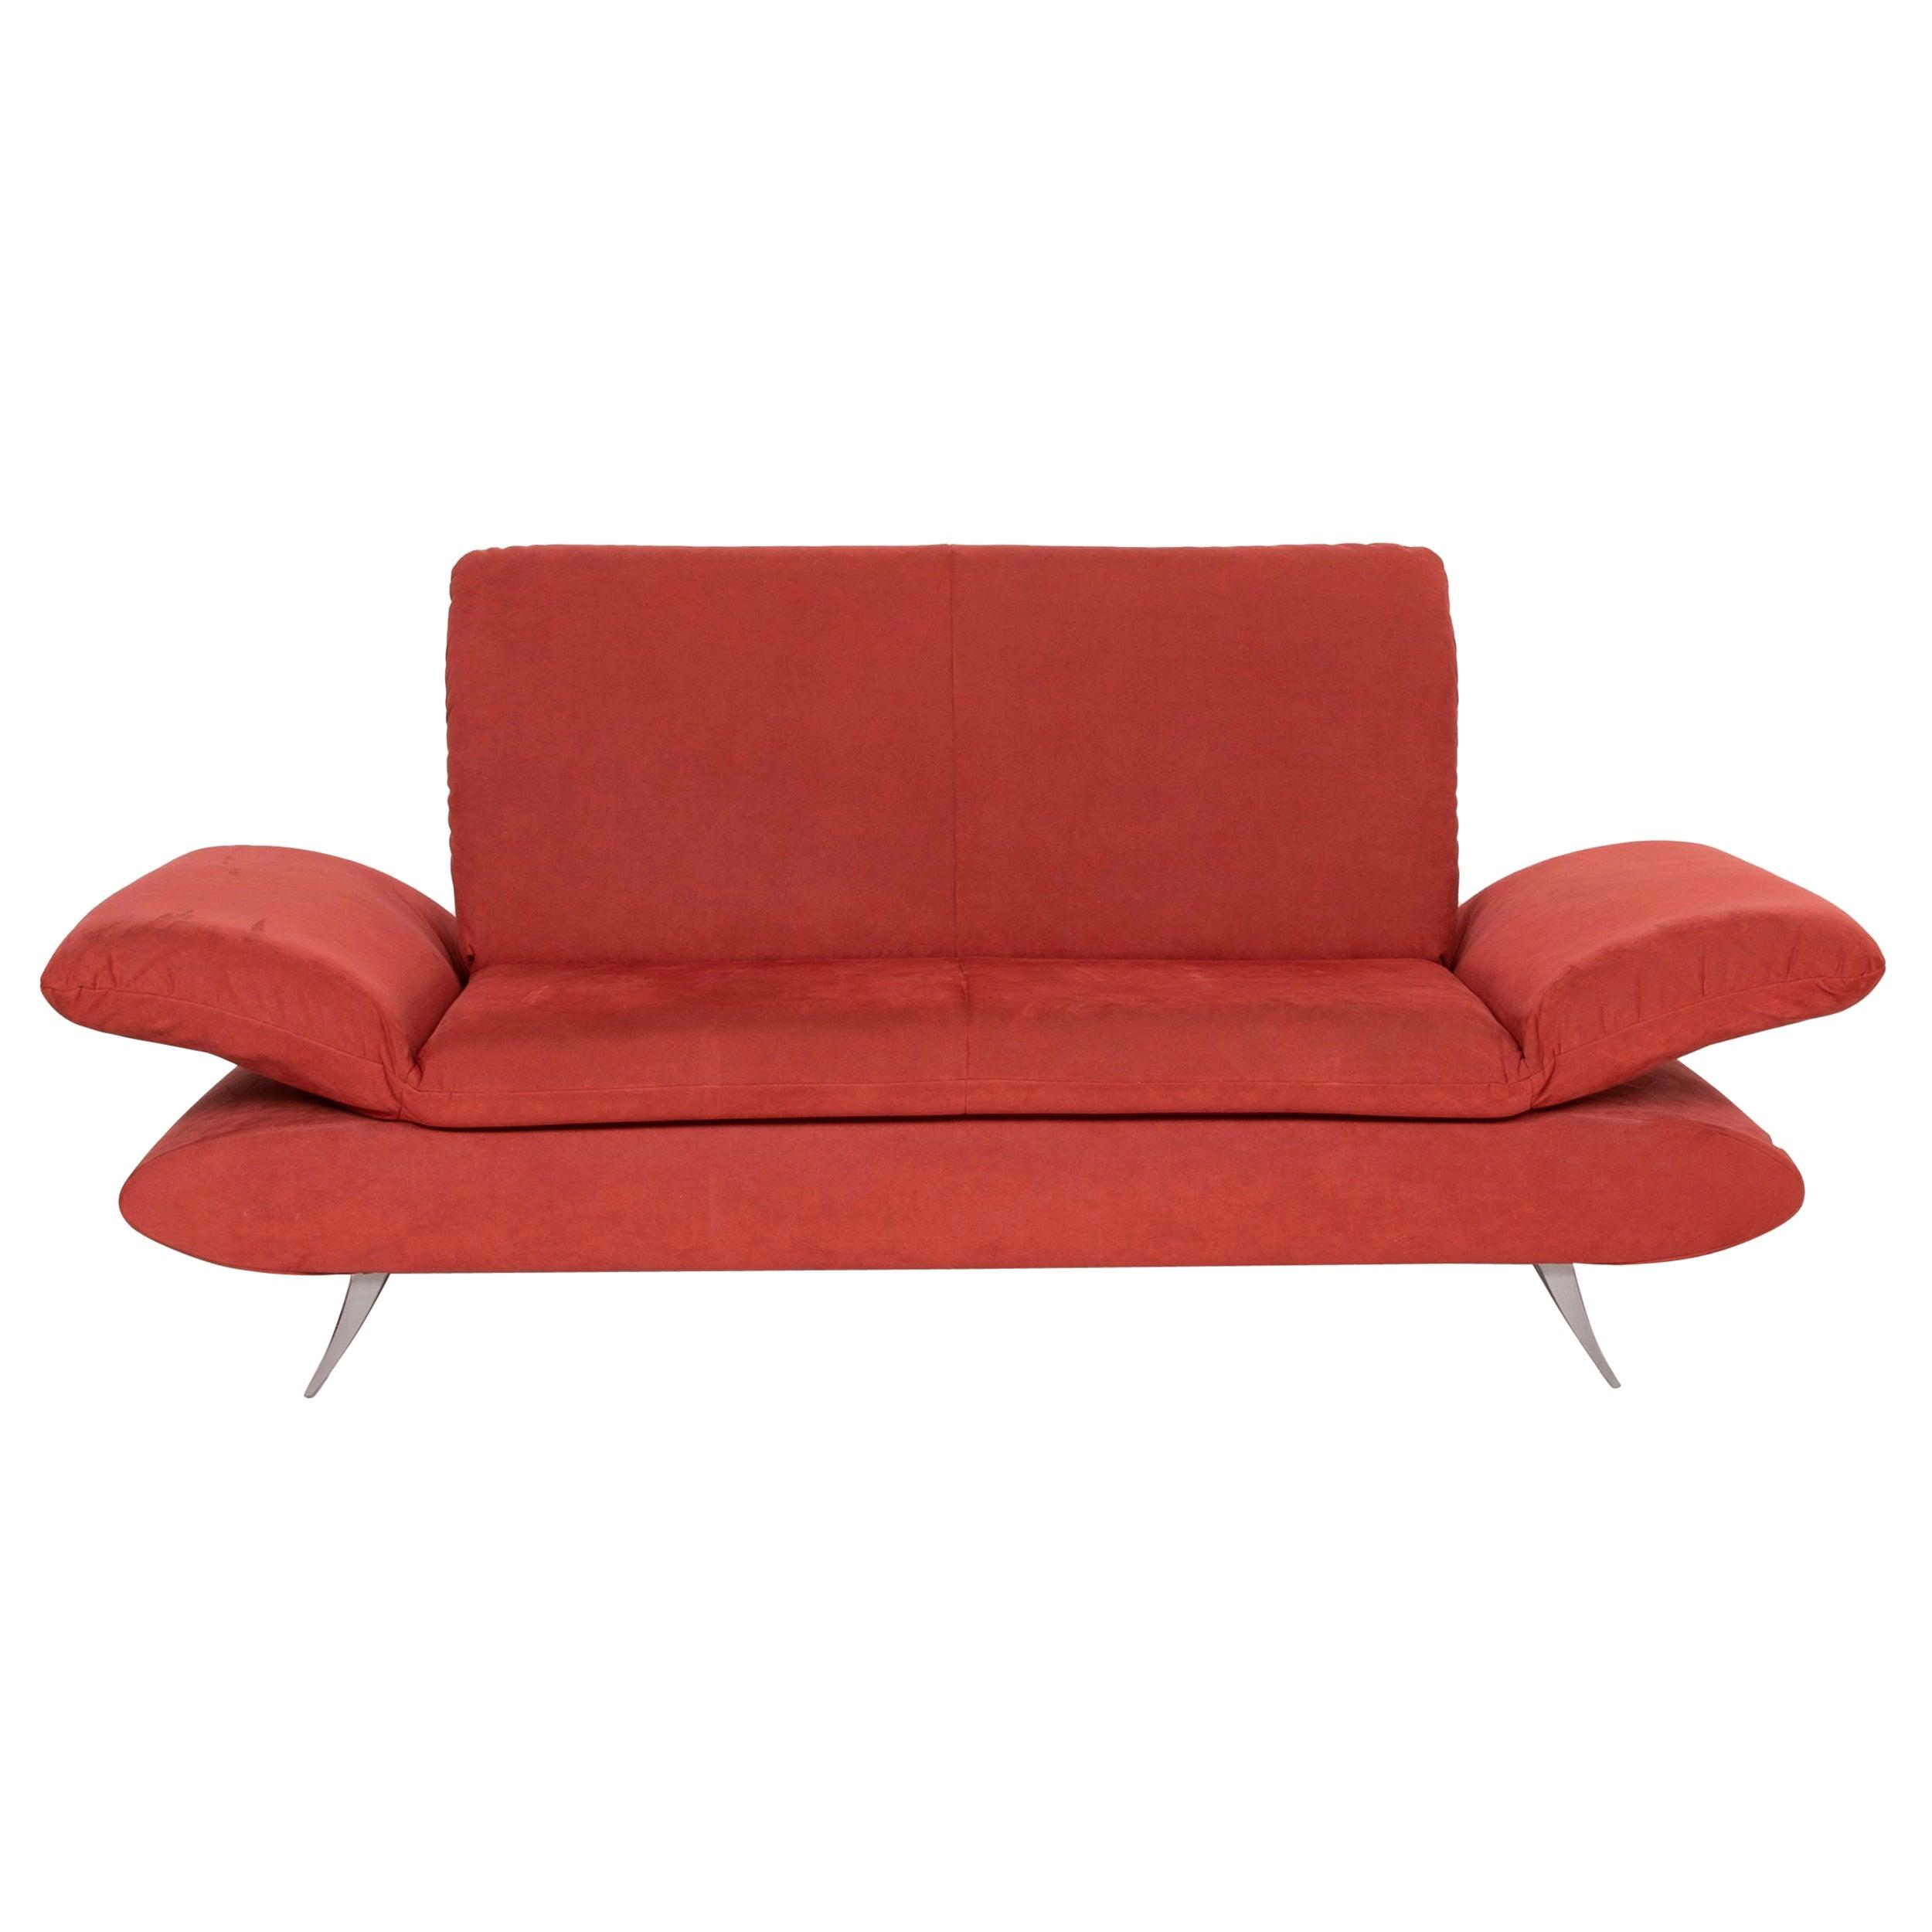 Koinor Rossini Fabric Sofa Orange Two-Seater Function